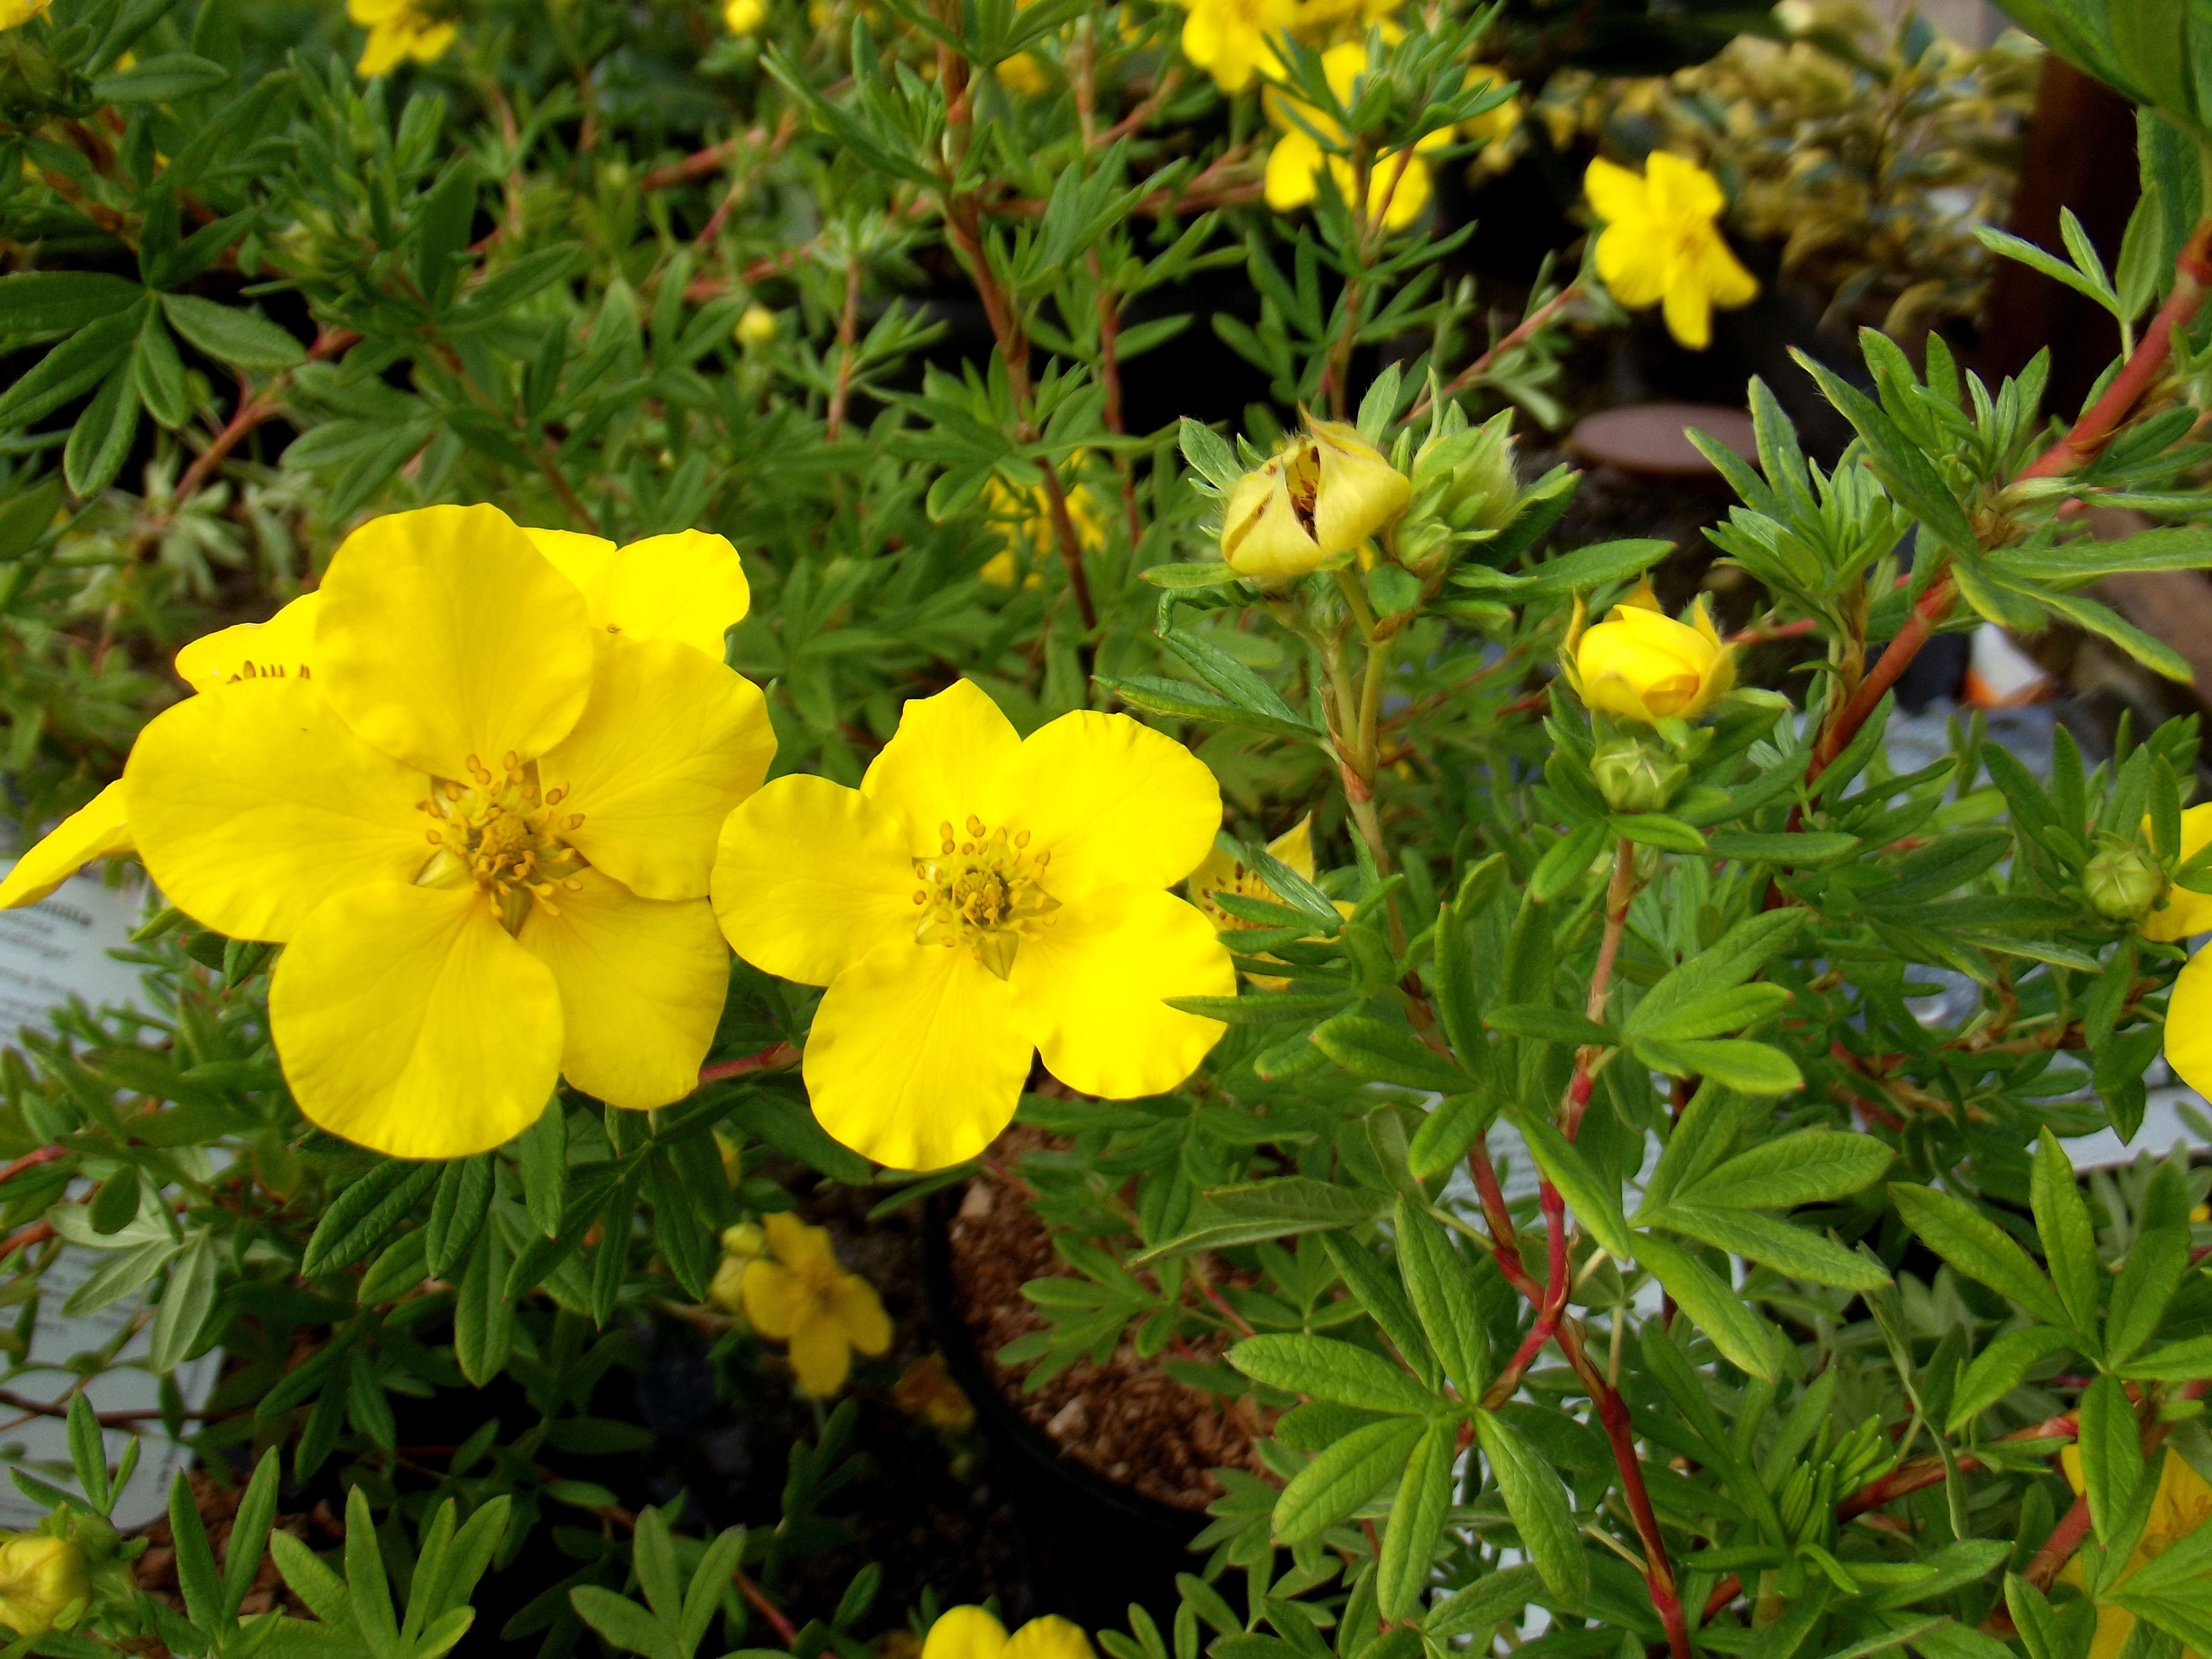 Potentilla Fructicos Gold Finger Buttercup shrub With an